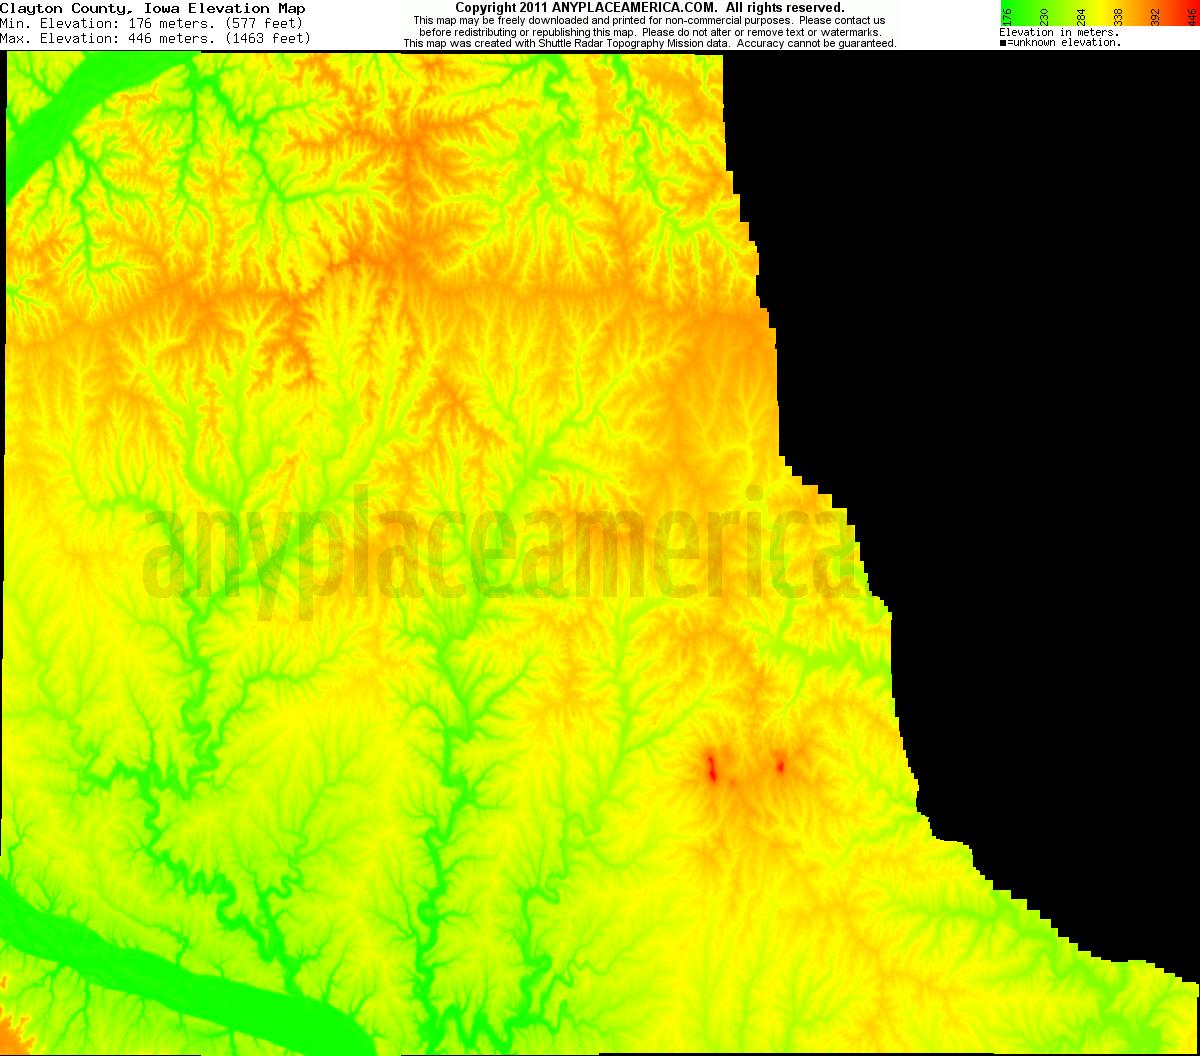 free clayton county iowa topo maps elevations free clayton county iowa topo maps